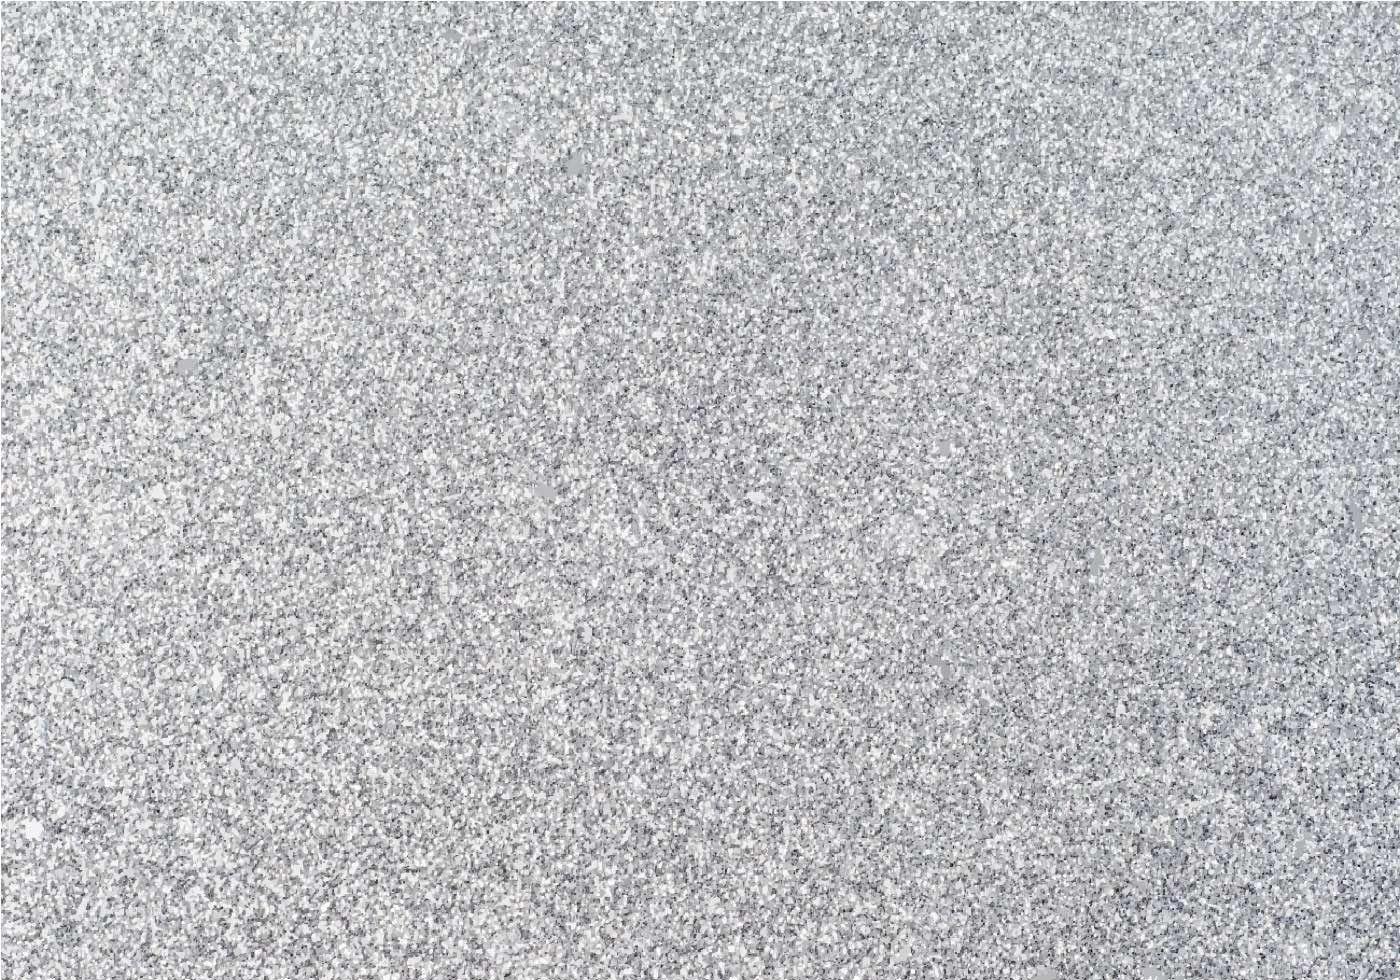 Superior Silver Glitter Background